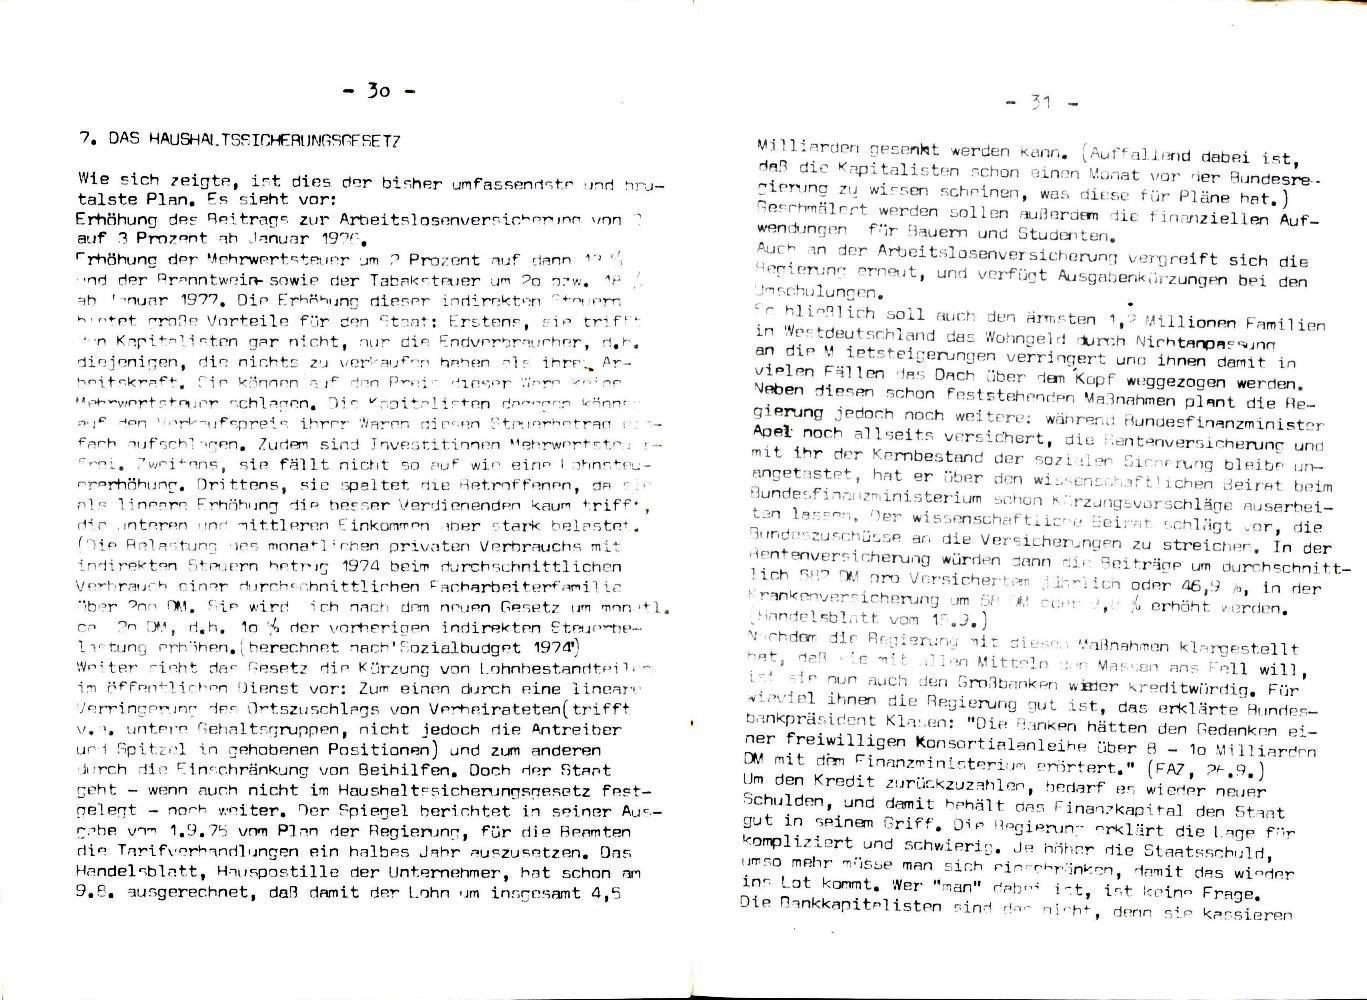 Aachen_KHI_1975_Krise_16